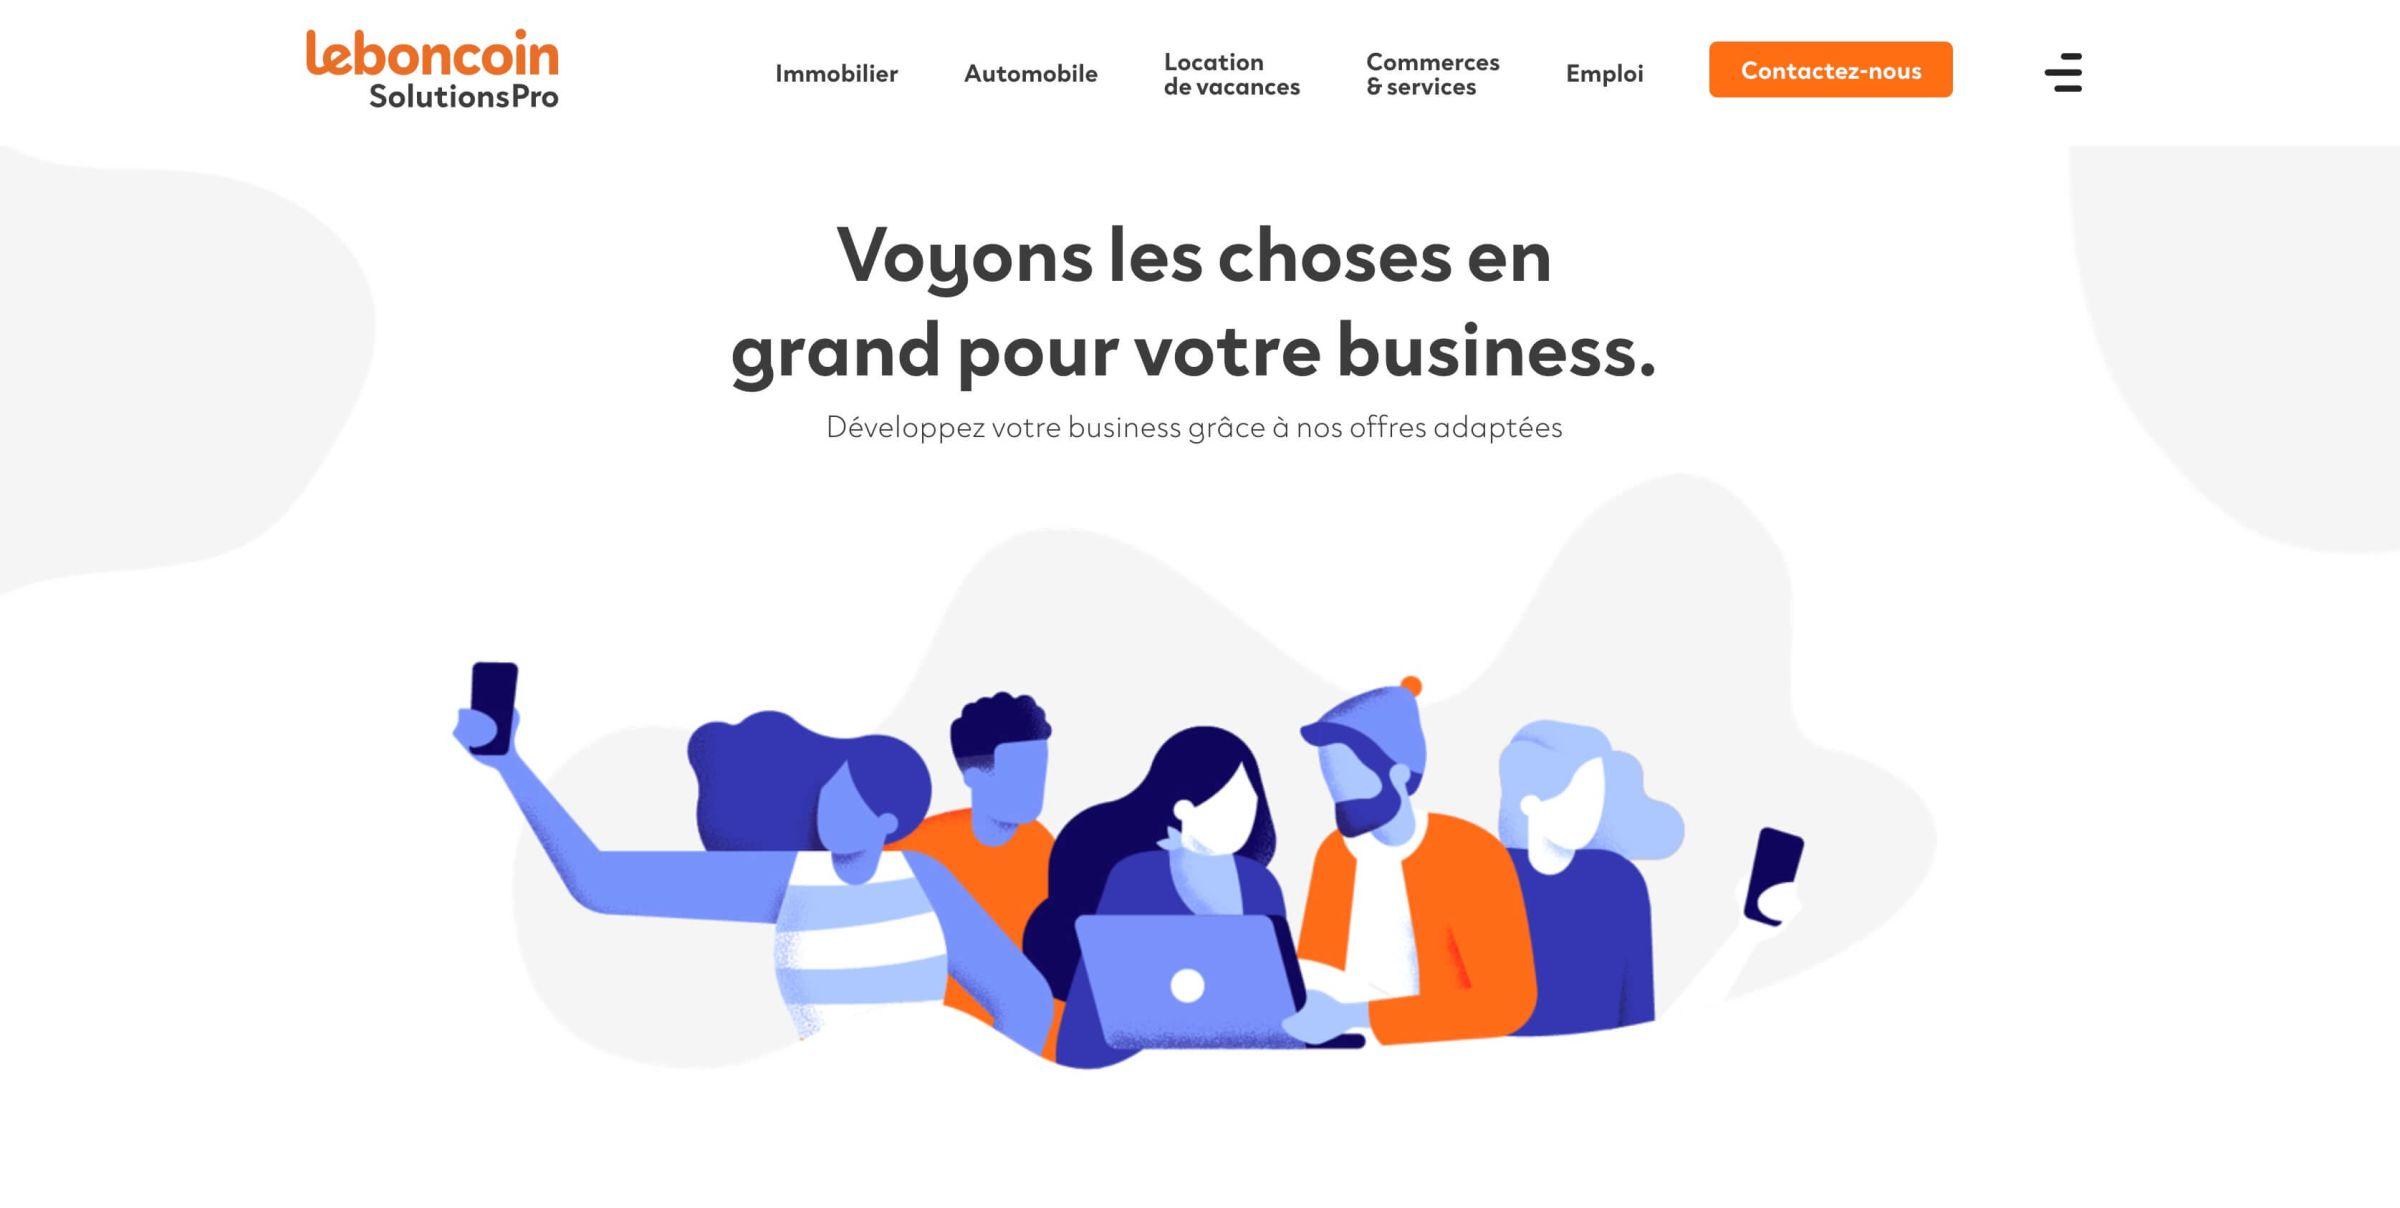 leboncoinsolutionspro-website-screenshot